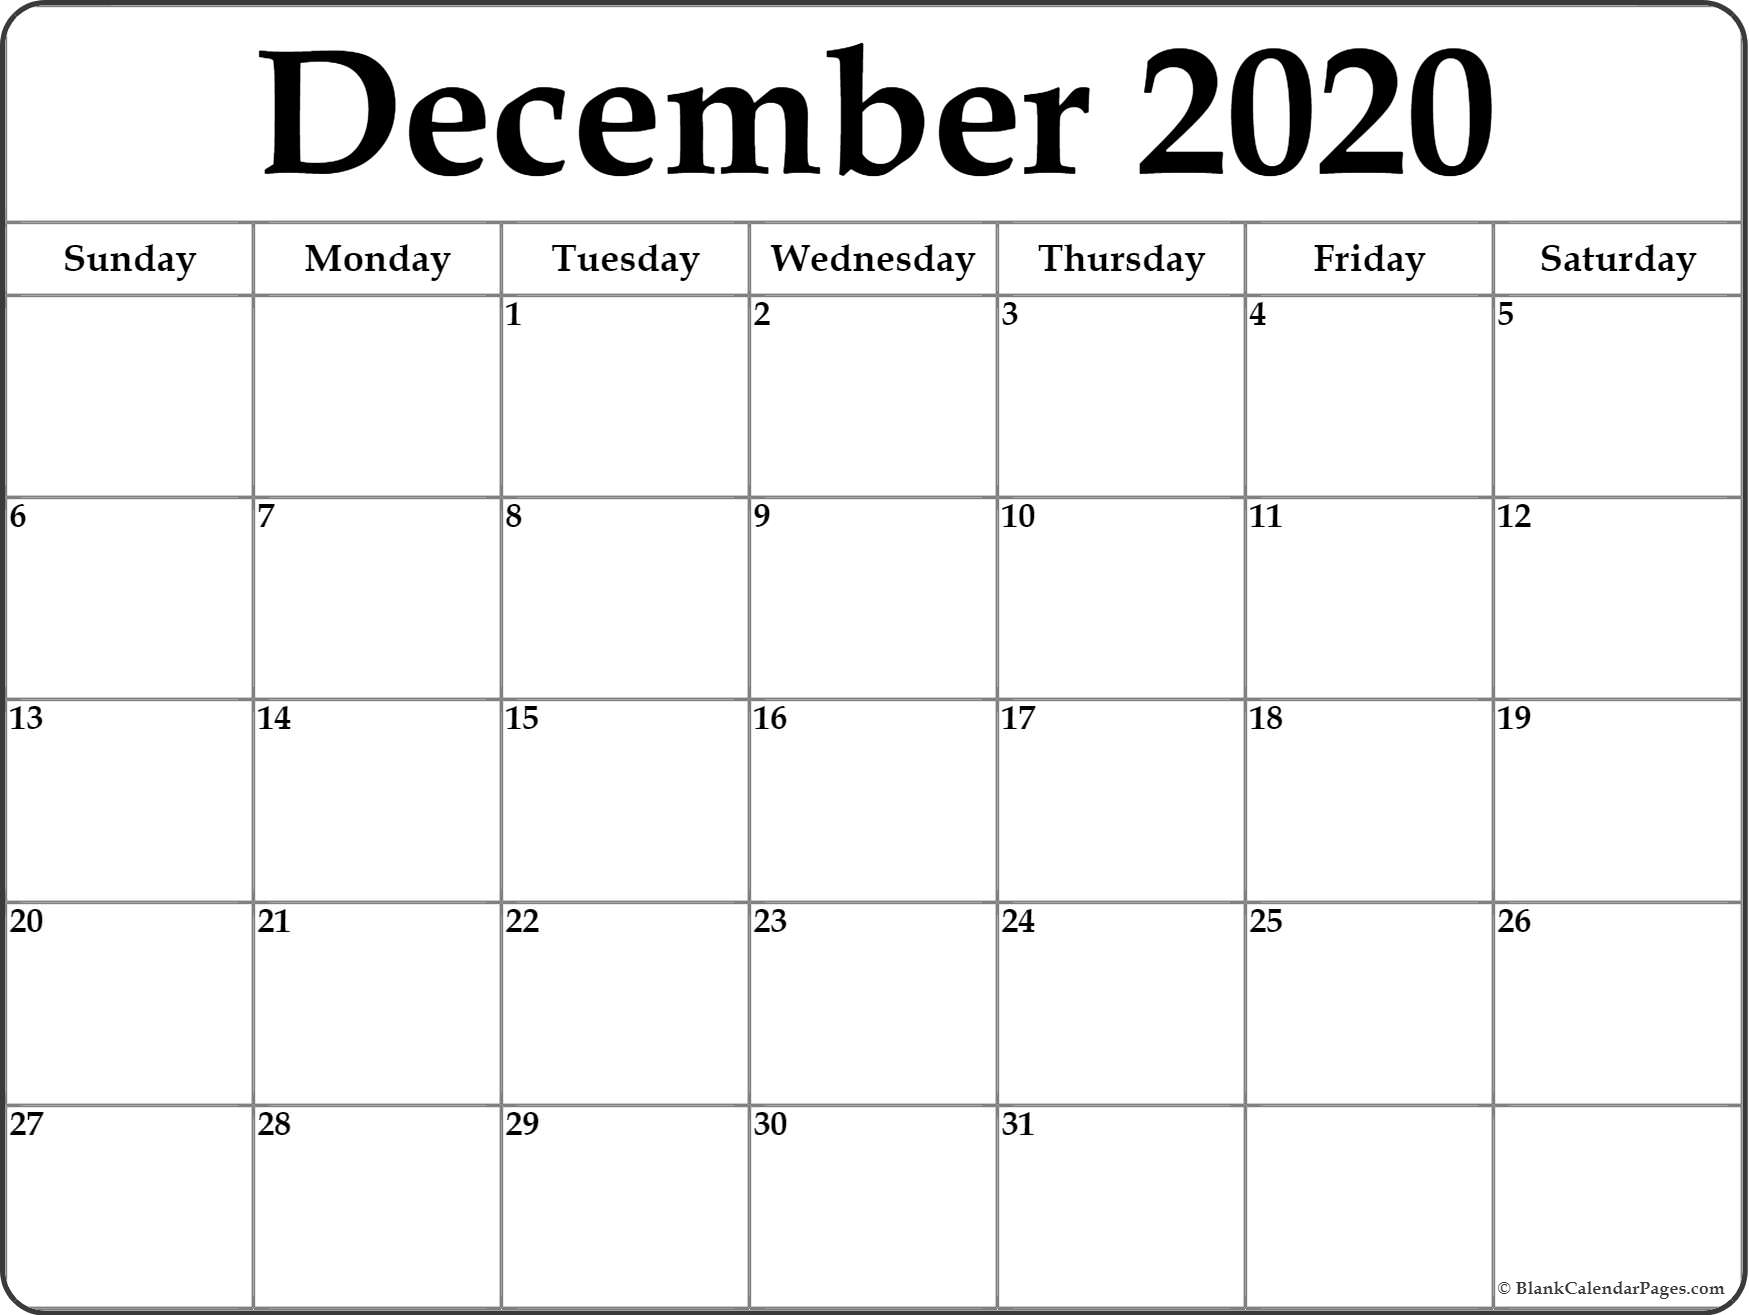 December 2020 Calendar | Free Printable Monthly Calendars intended for December Blank Monthly Calendar